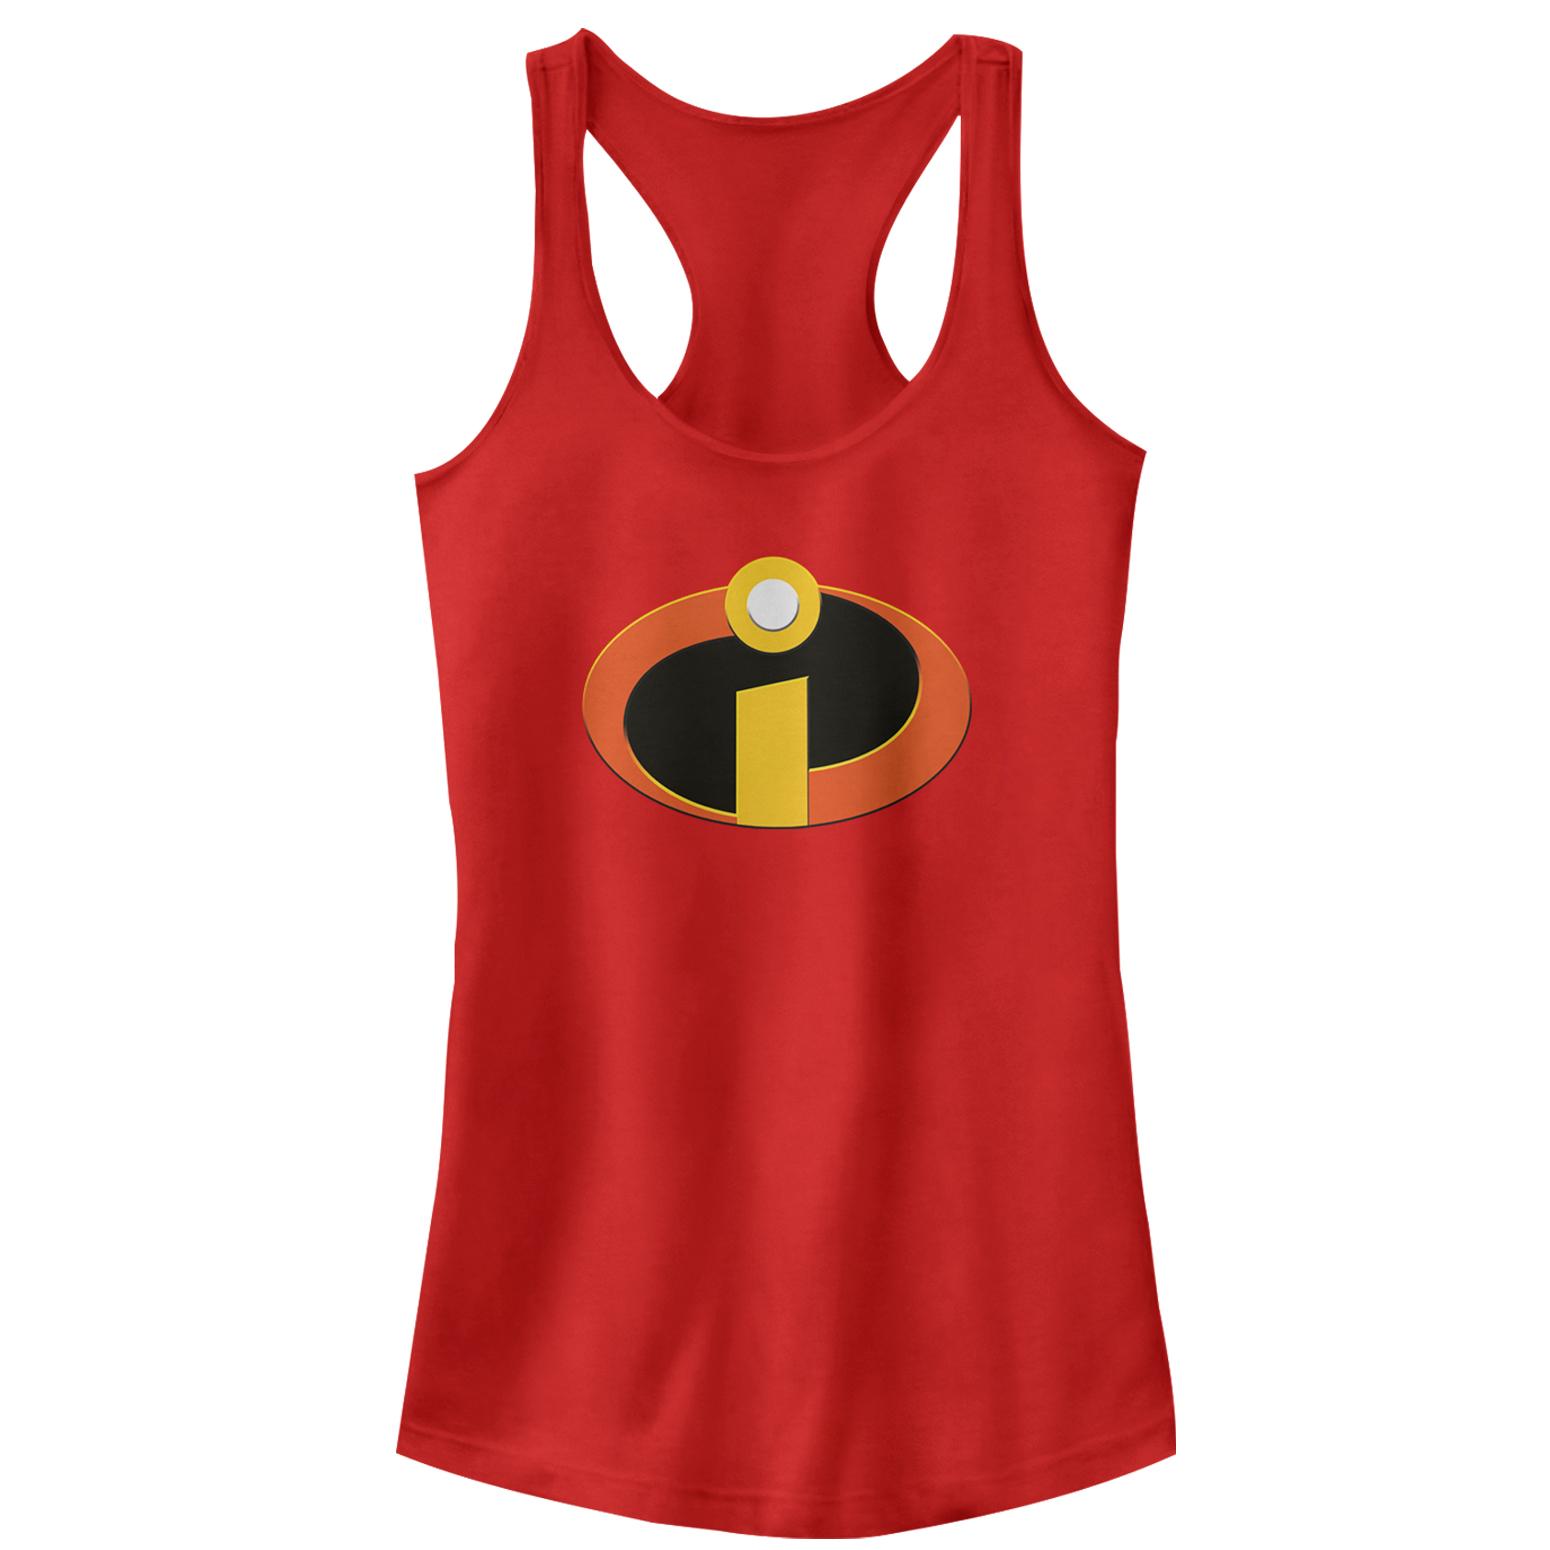 The Incredibles Juniors' Classic Logo Racerback Tank Top